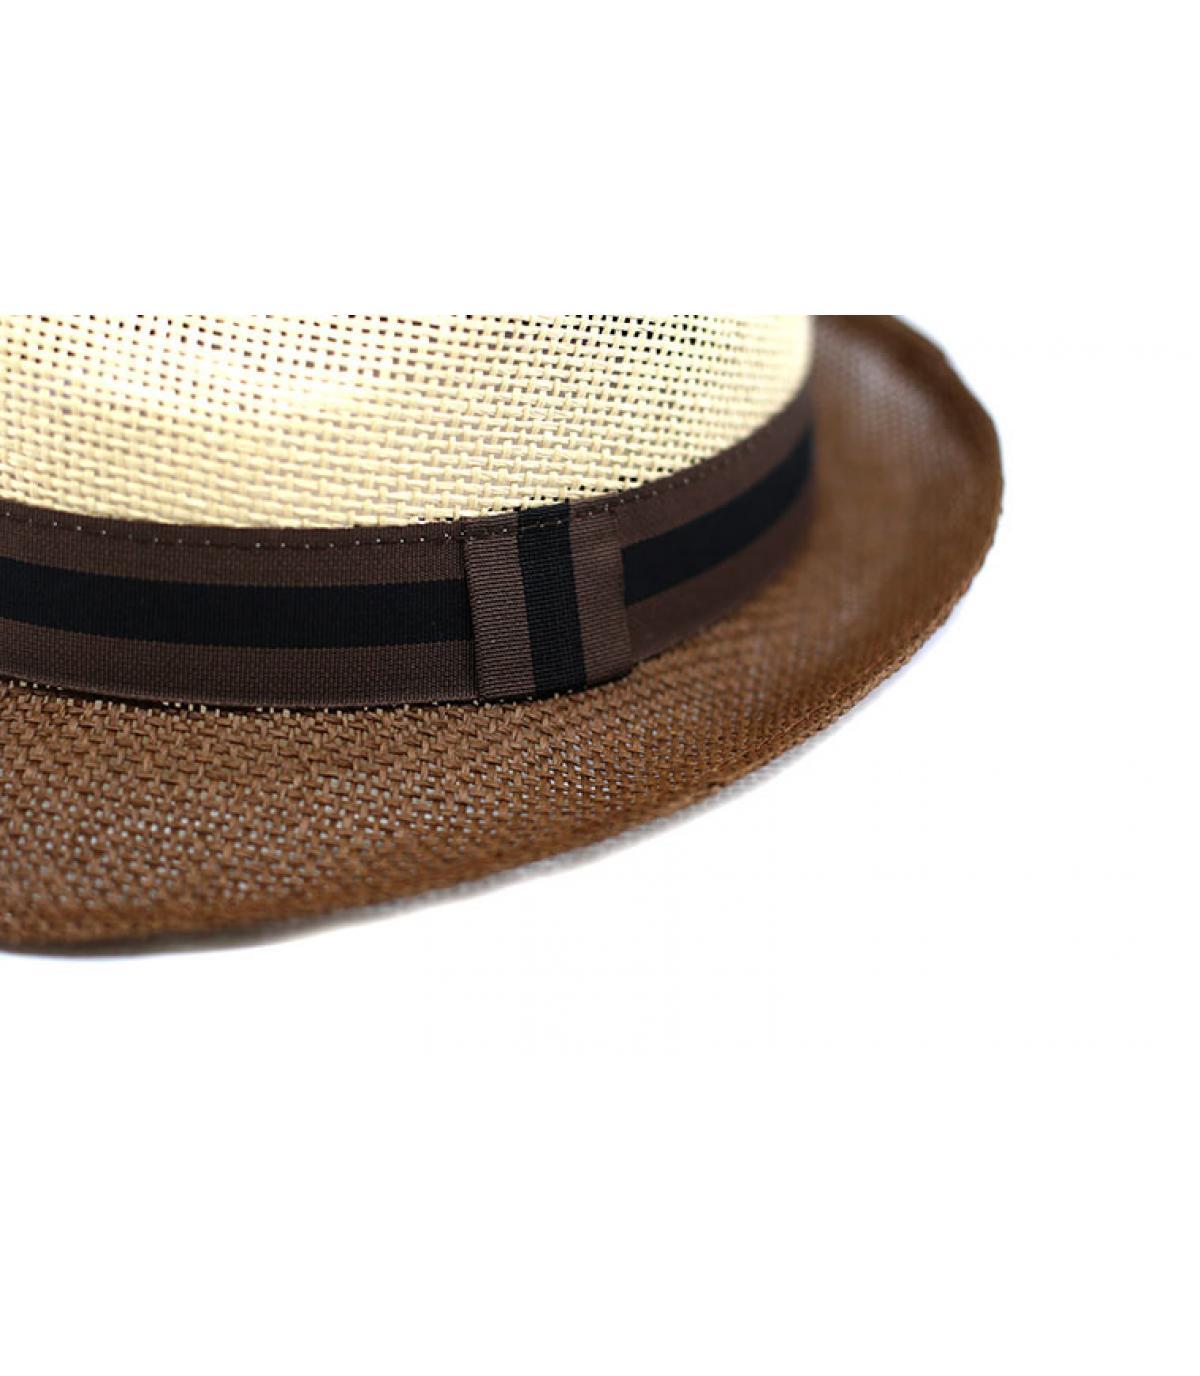 Details Carpino Fine Paper Bic beige brown - afbeeling 3